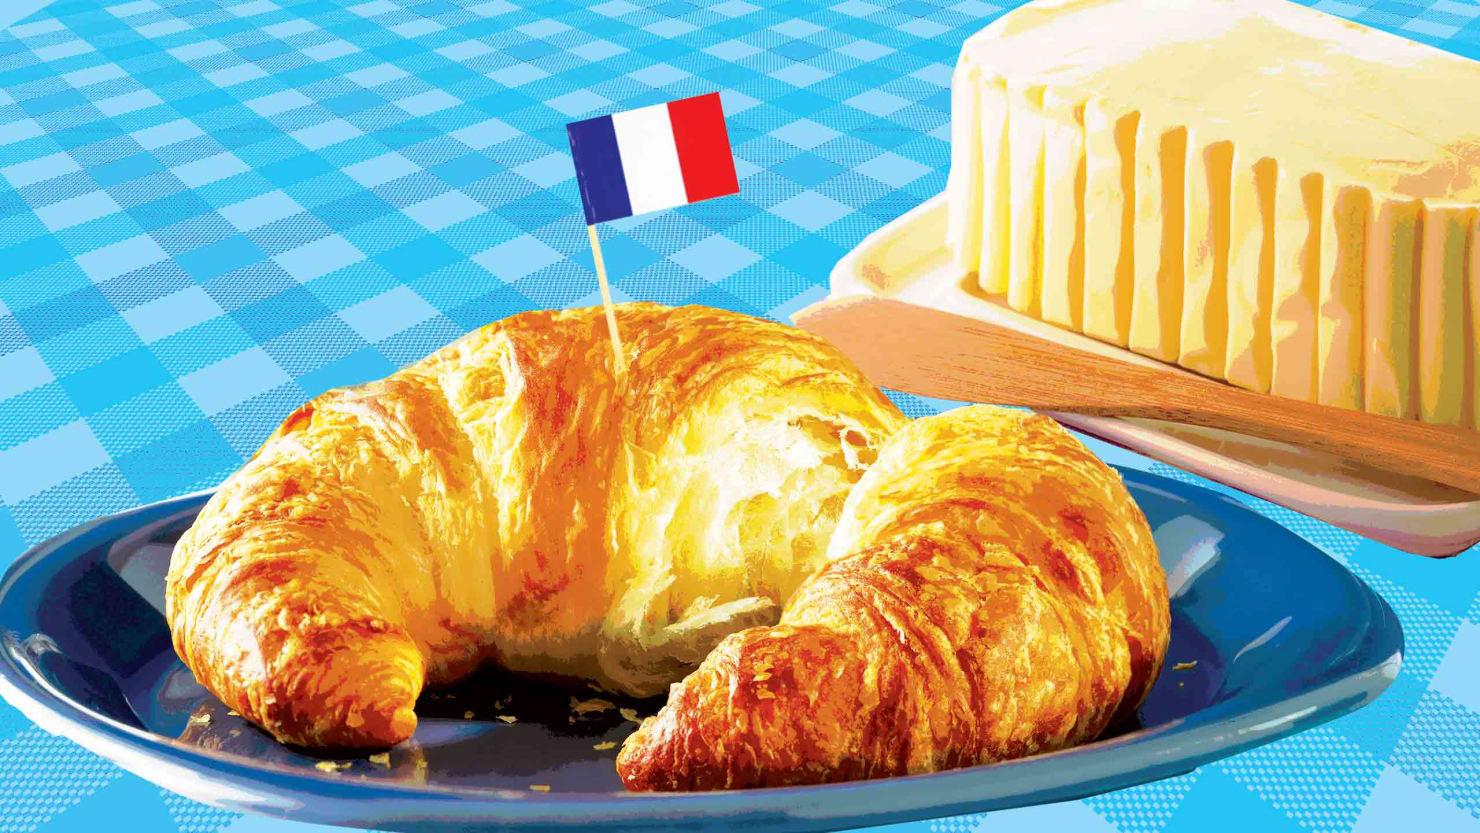 flake news france faces a major croissant shortage